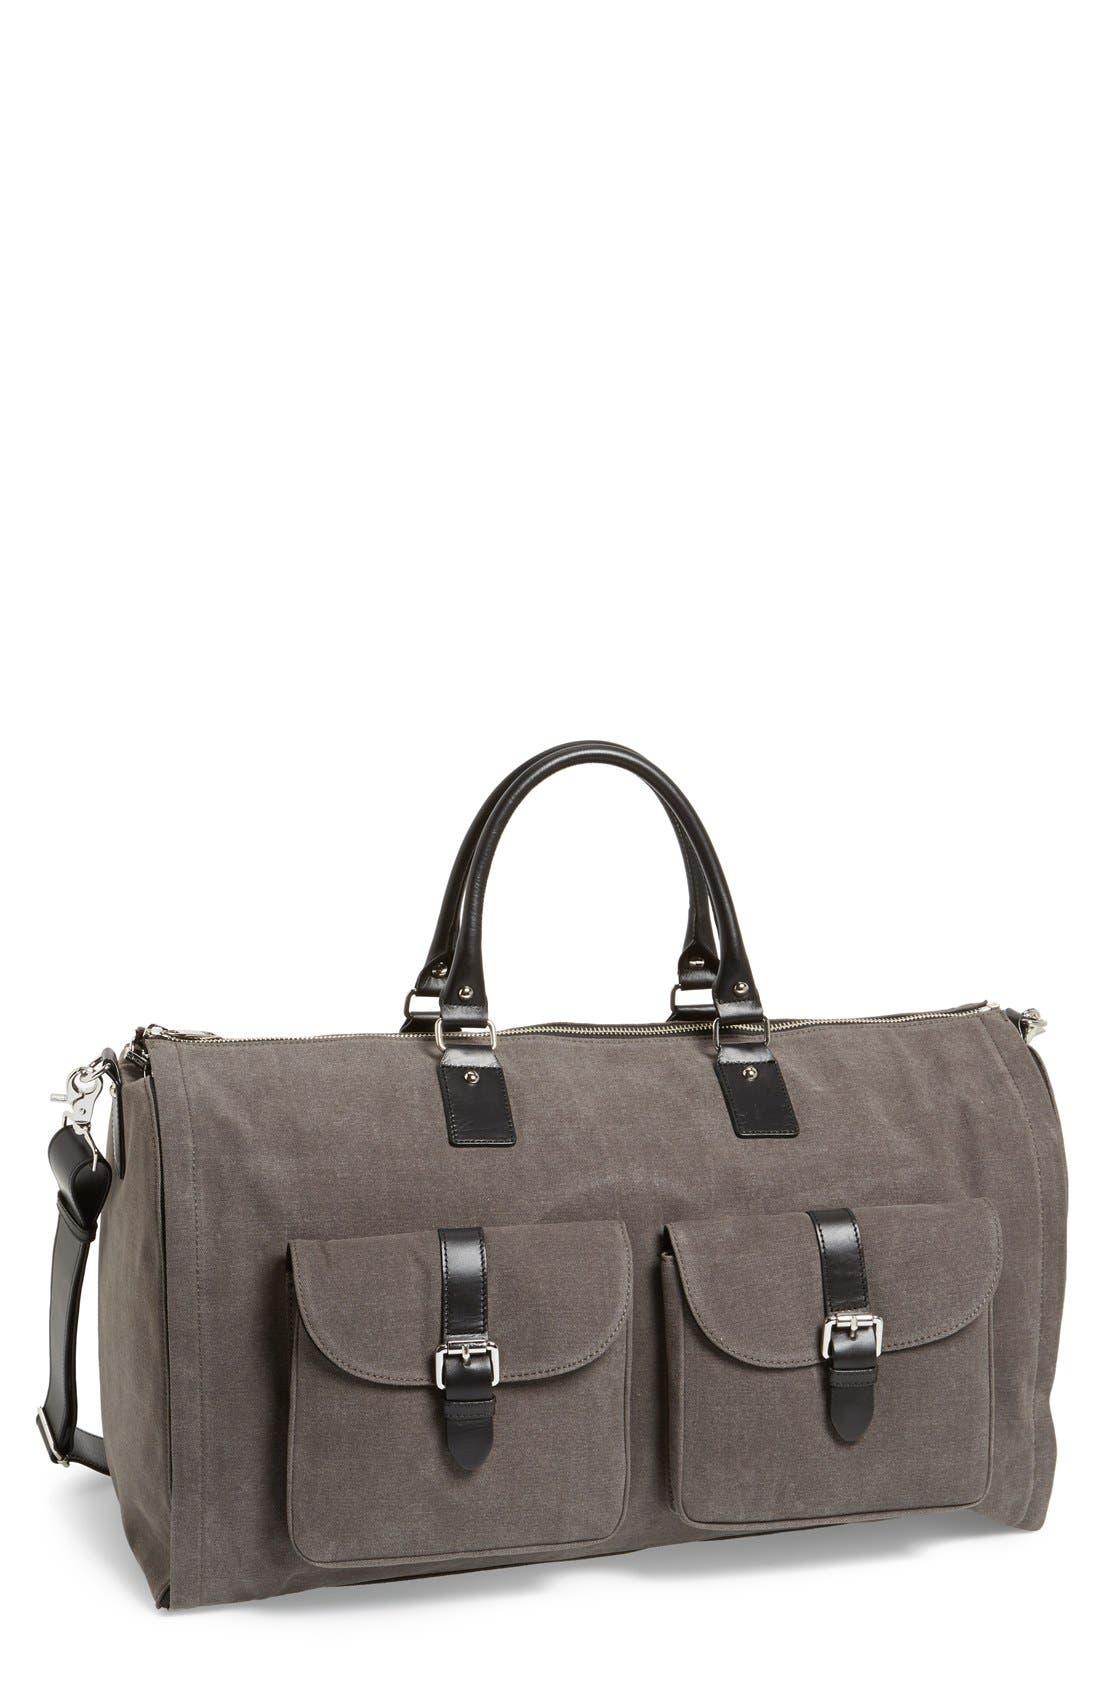 Canvas Garment/Duffel Bag,                             Main thumbnail 1, color,                             020